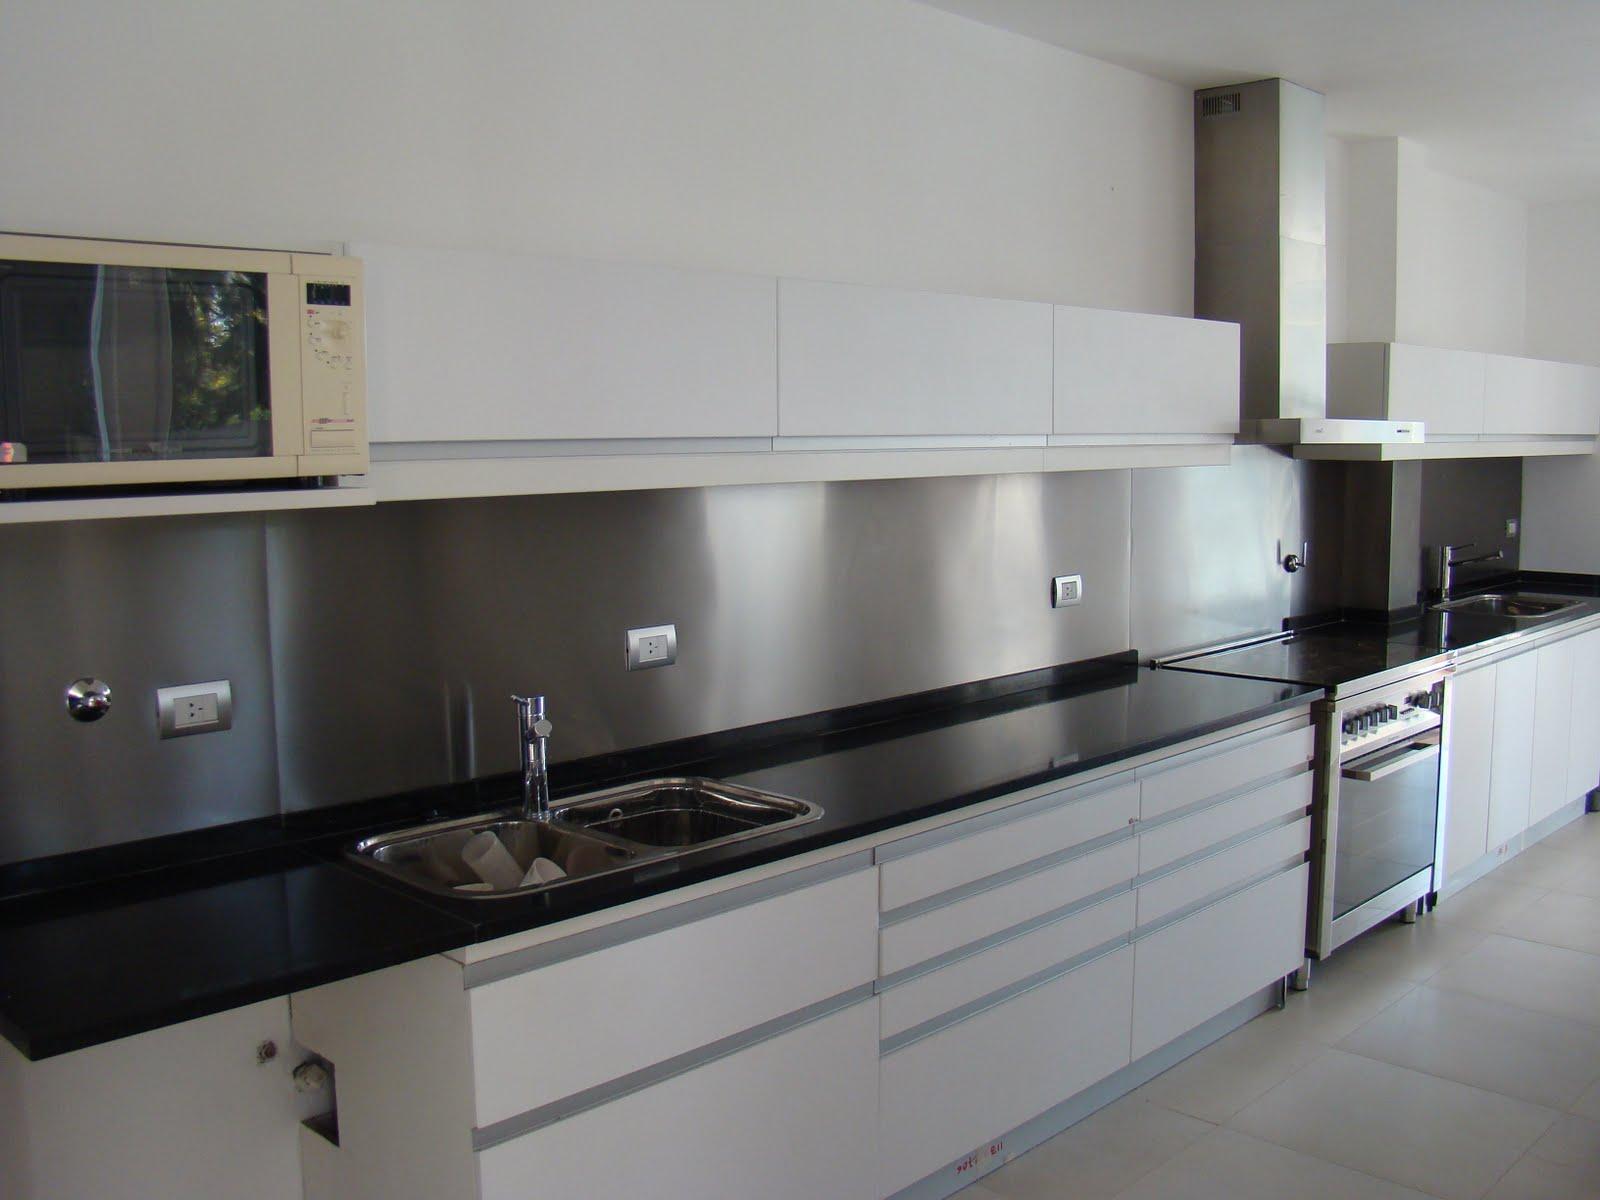 Melen cocinas - Revestimientos para cocinas ...